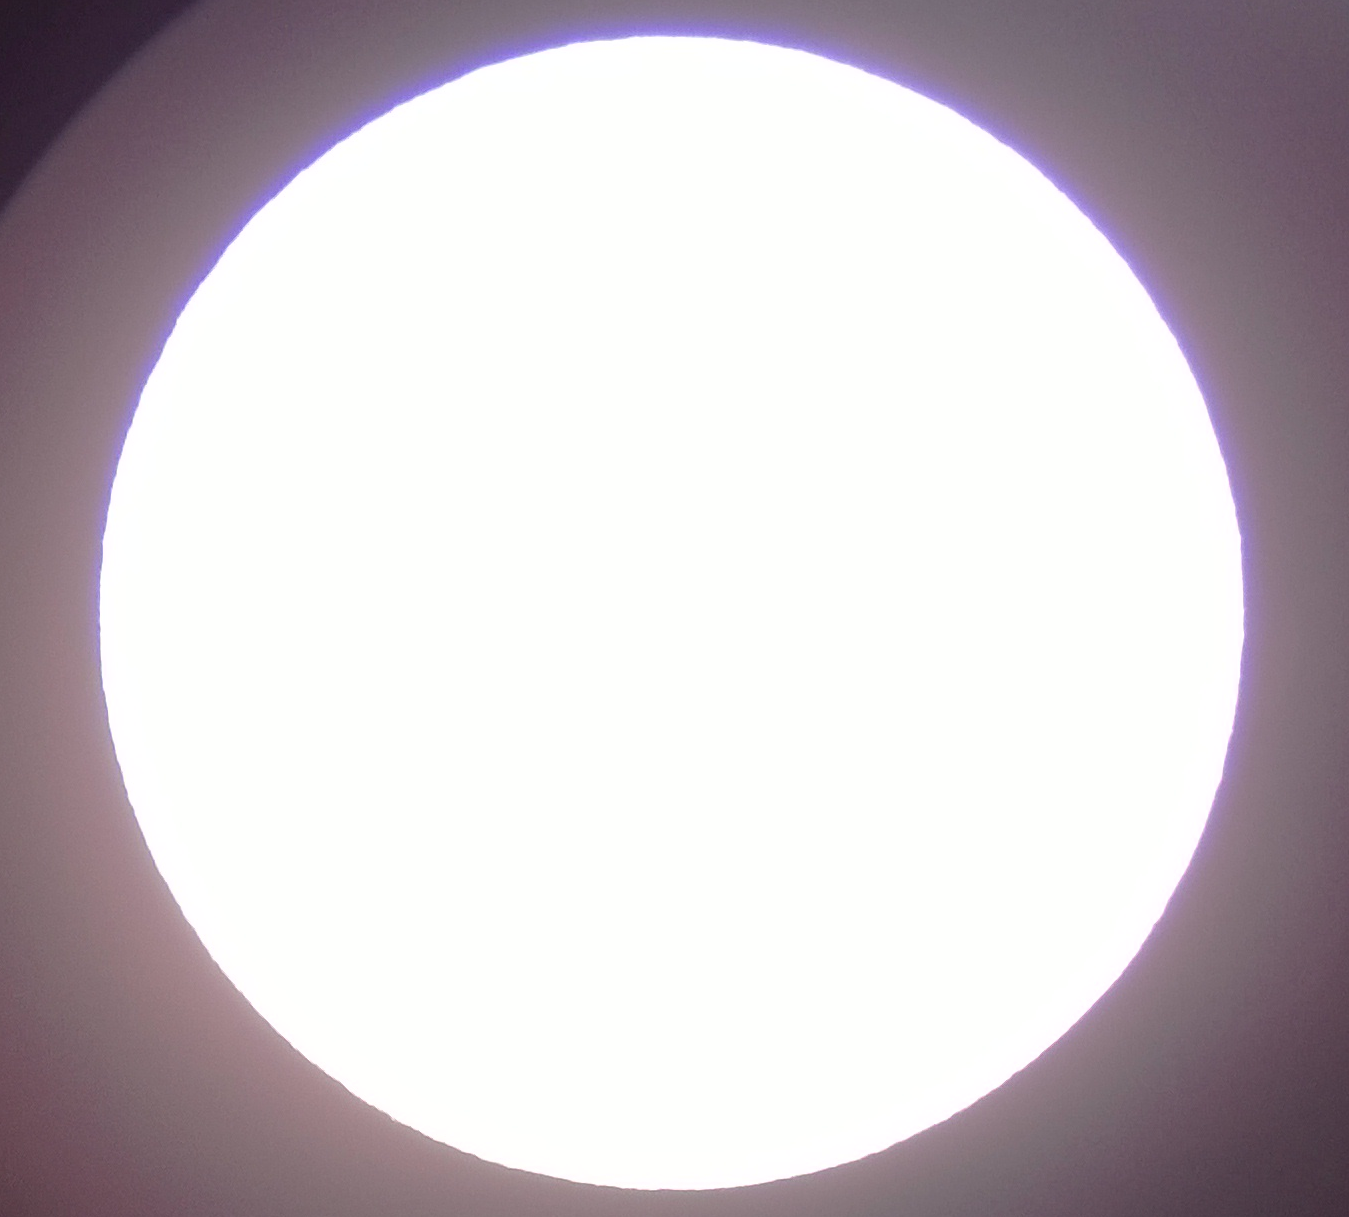 Sun_08_01_2018.png